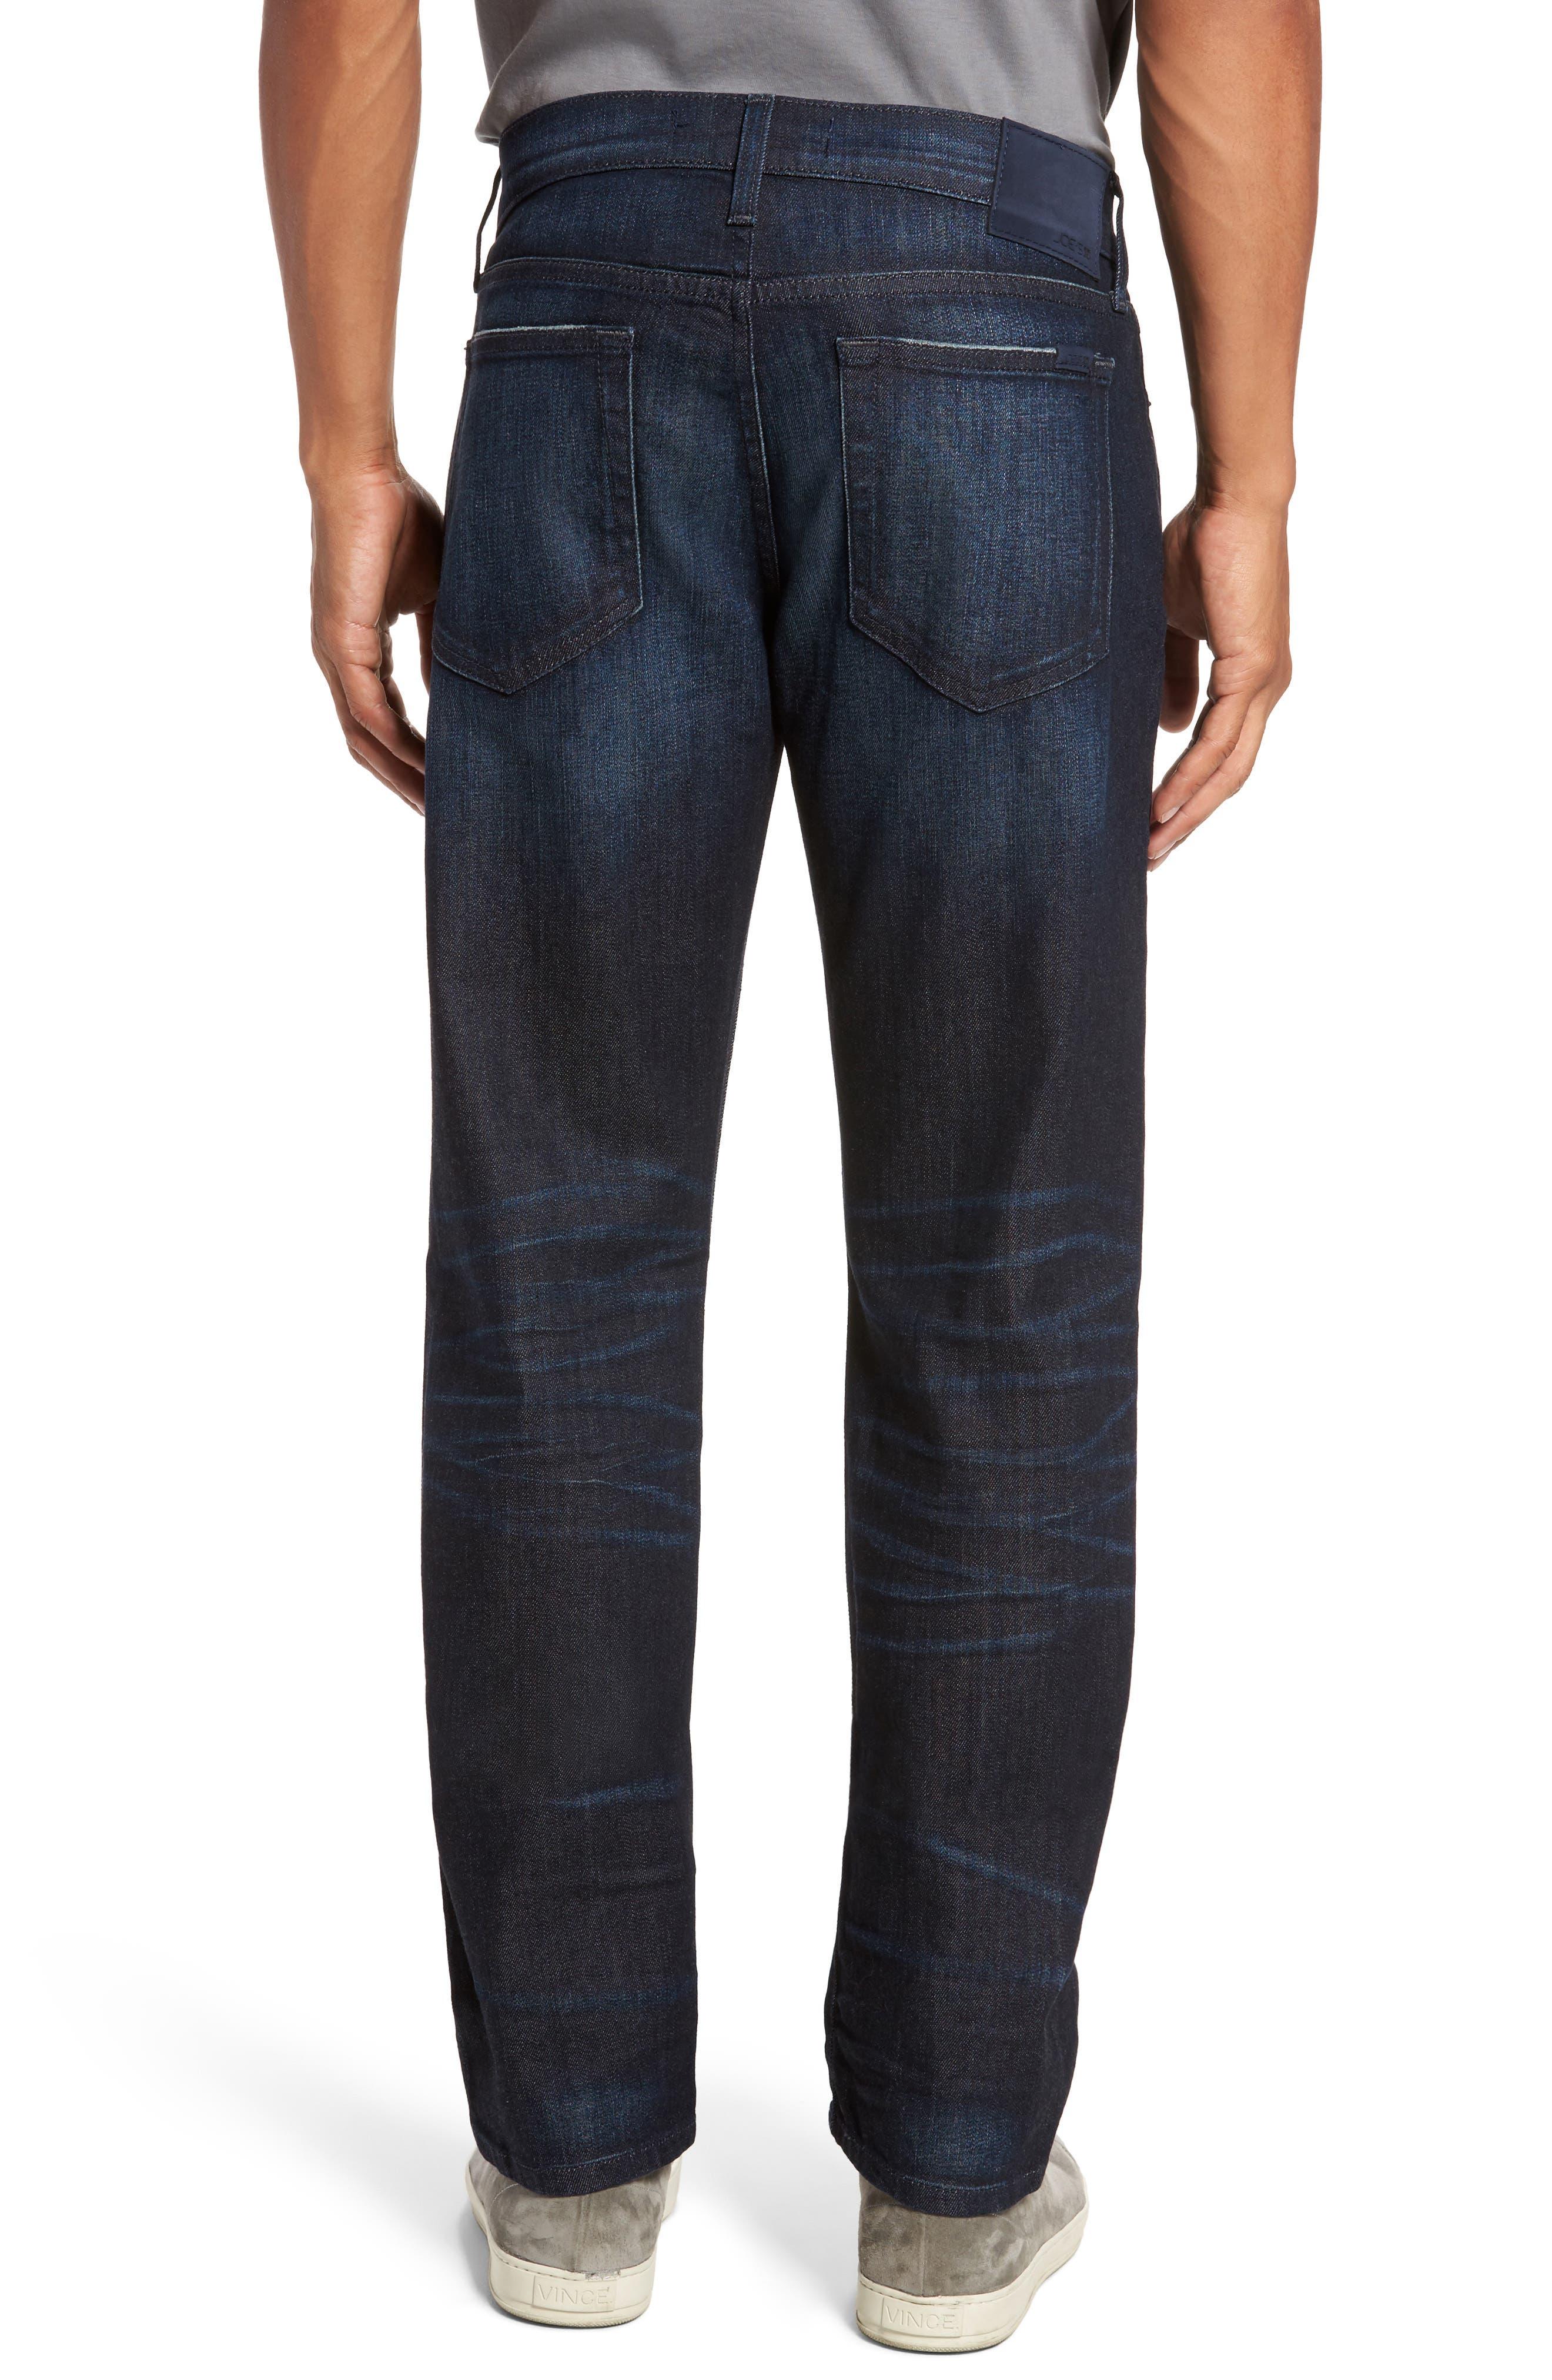 Brixton Slim Straight Fit Jeans,                             Alternate thumbnail 2, color,                             405